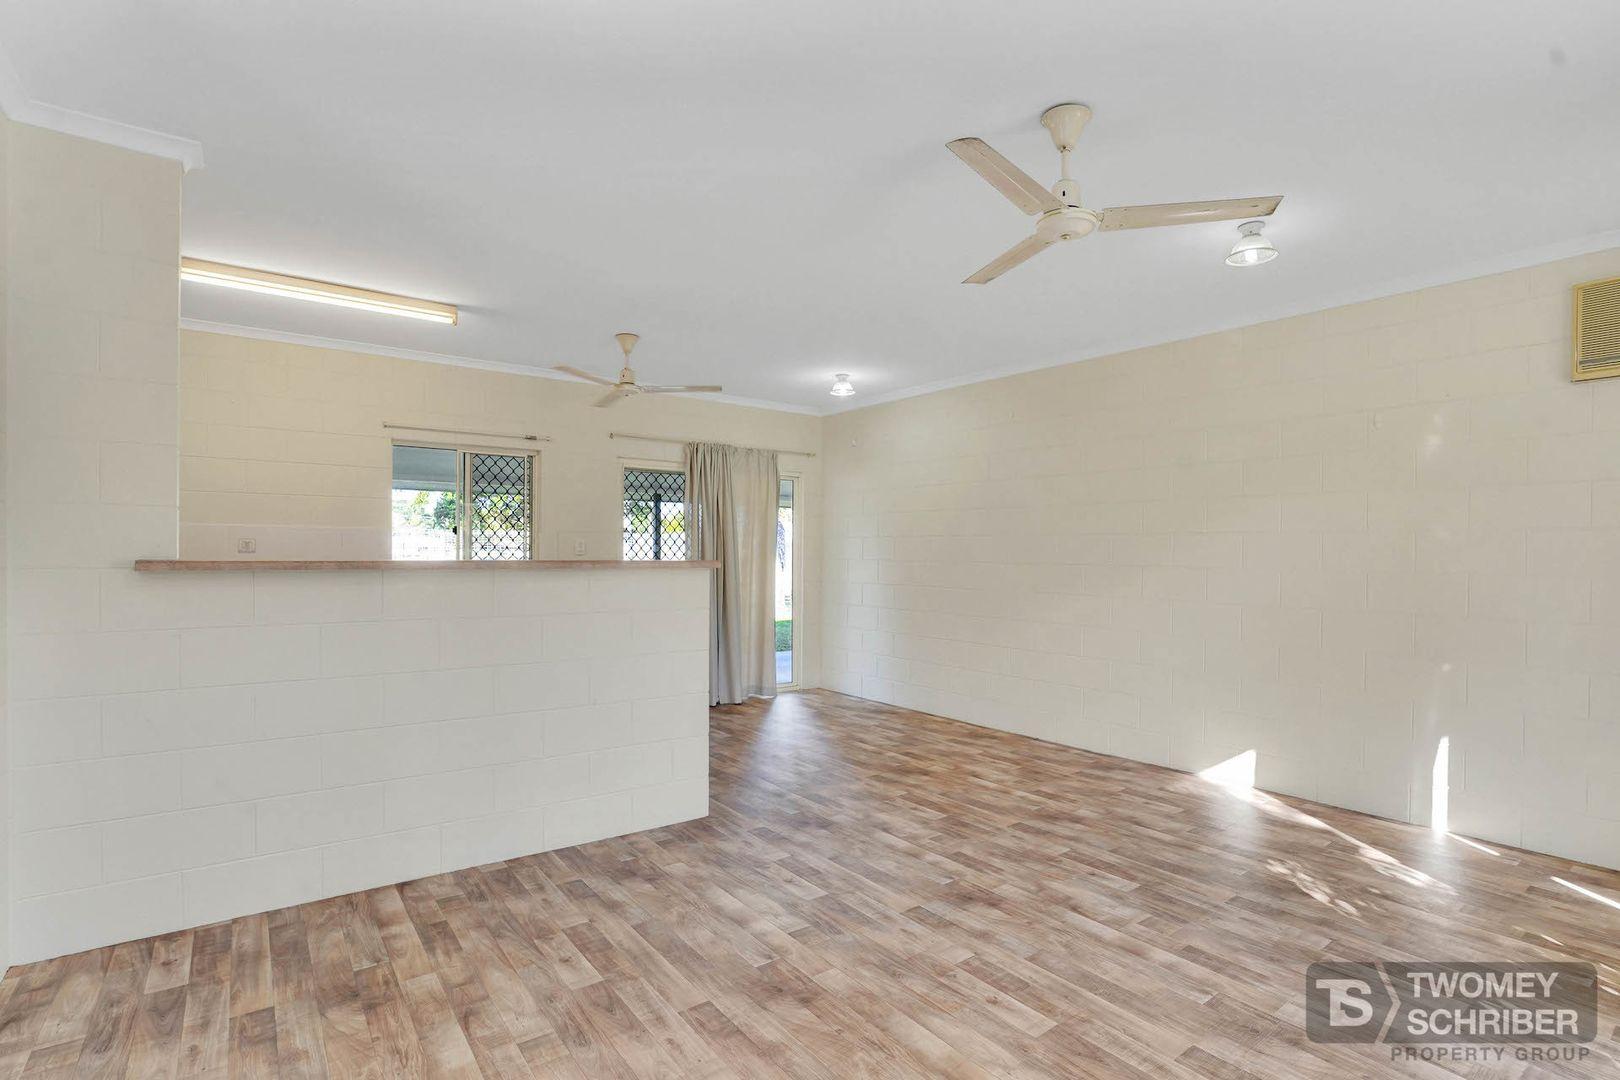 2/26 Clarke Street, Manunda QLD 4870, Image 1